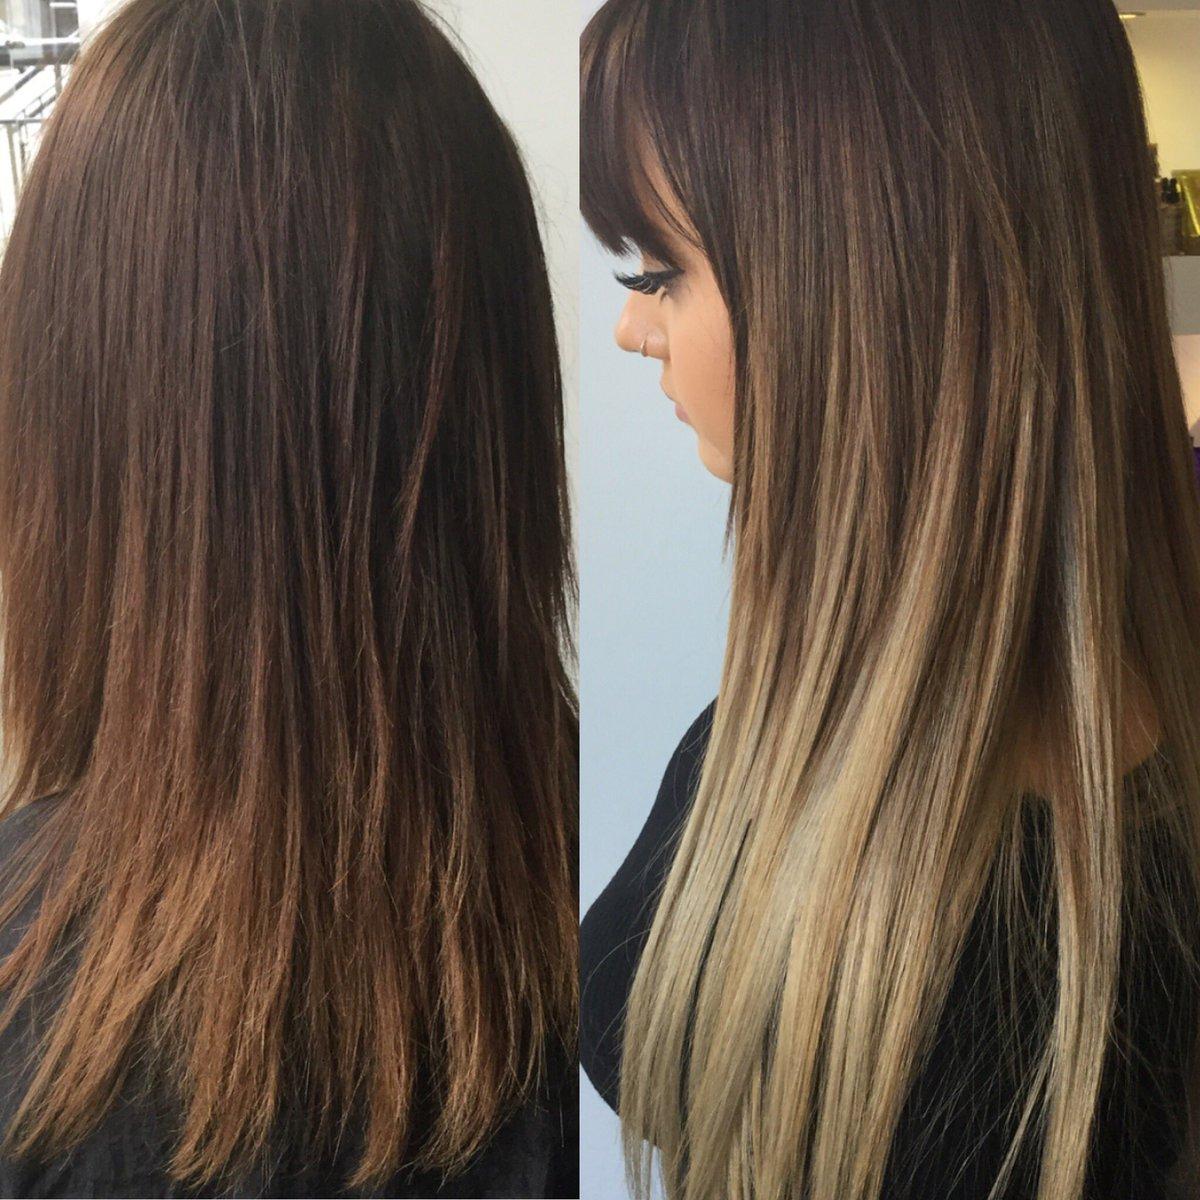 Balmain Hair Uk On Twitter Balmainized Striking Transformation By